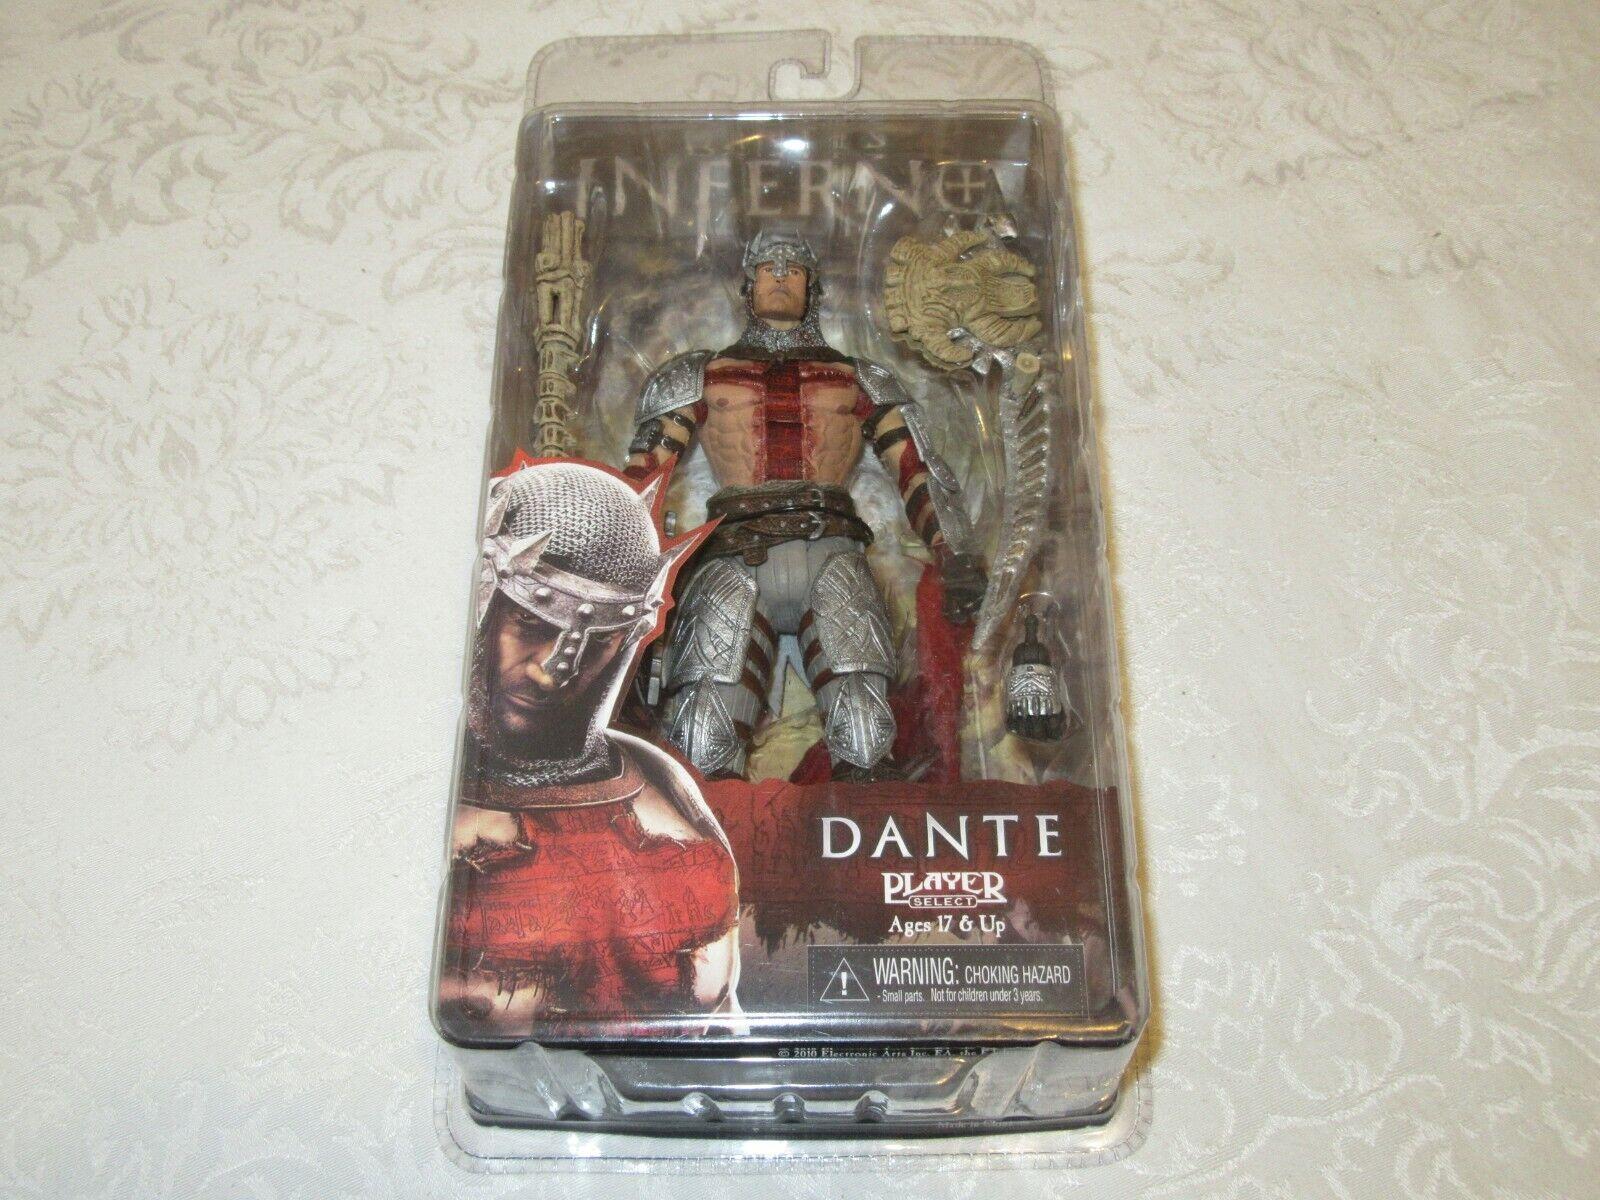 NECA Player Select Video buchstabieren EA Dante's Inferno - Dante Wirkung Figure